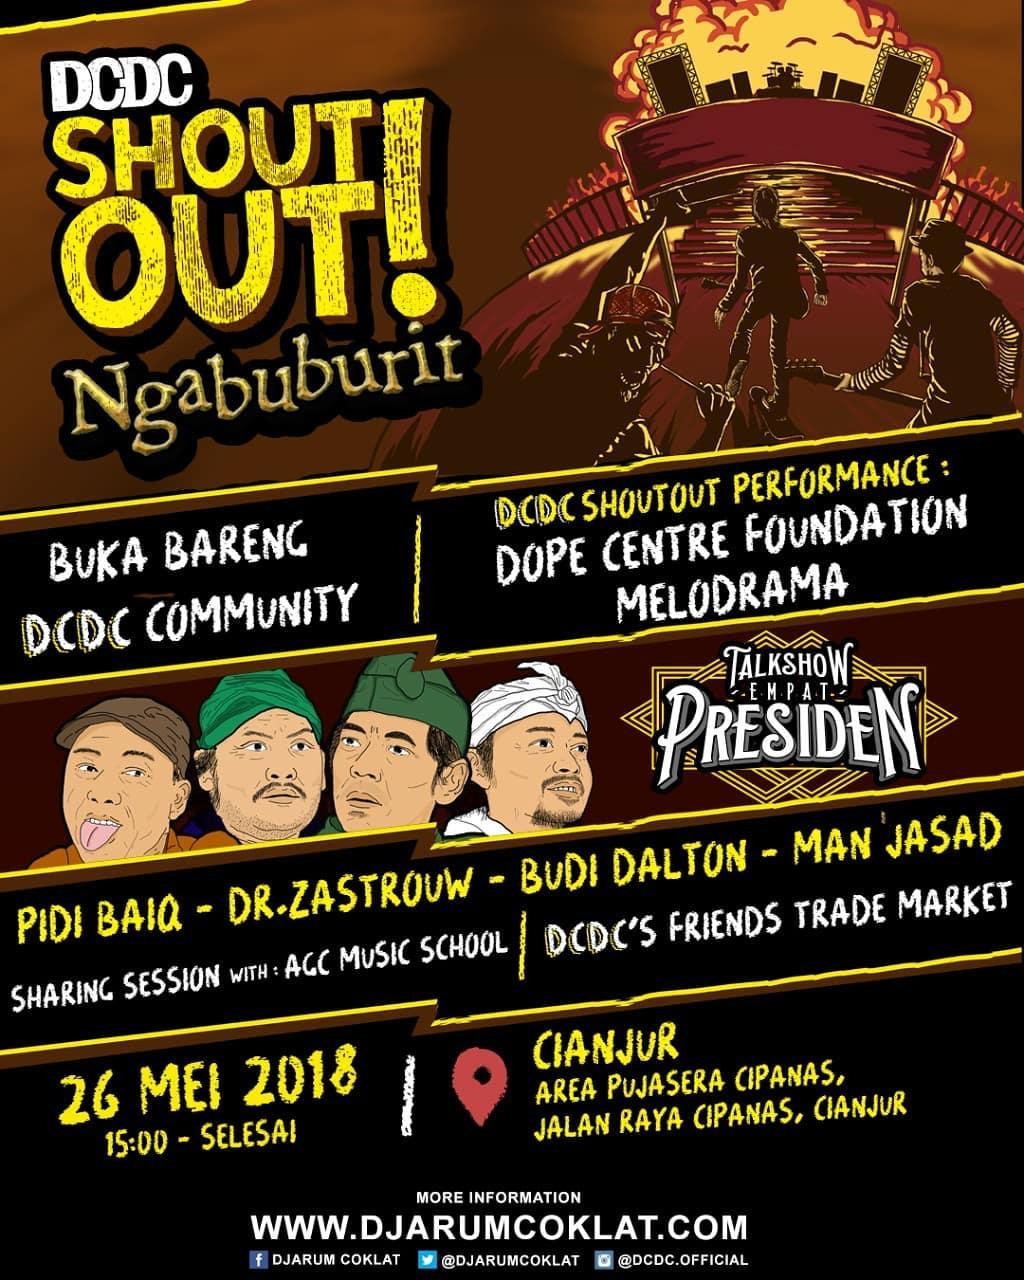 Shout Out! Ngabuburit Cianjur